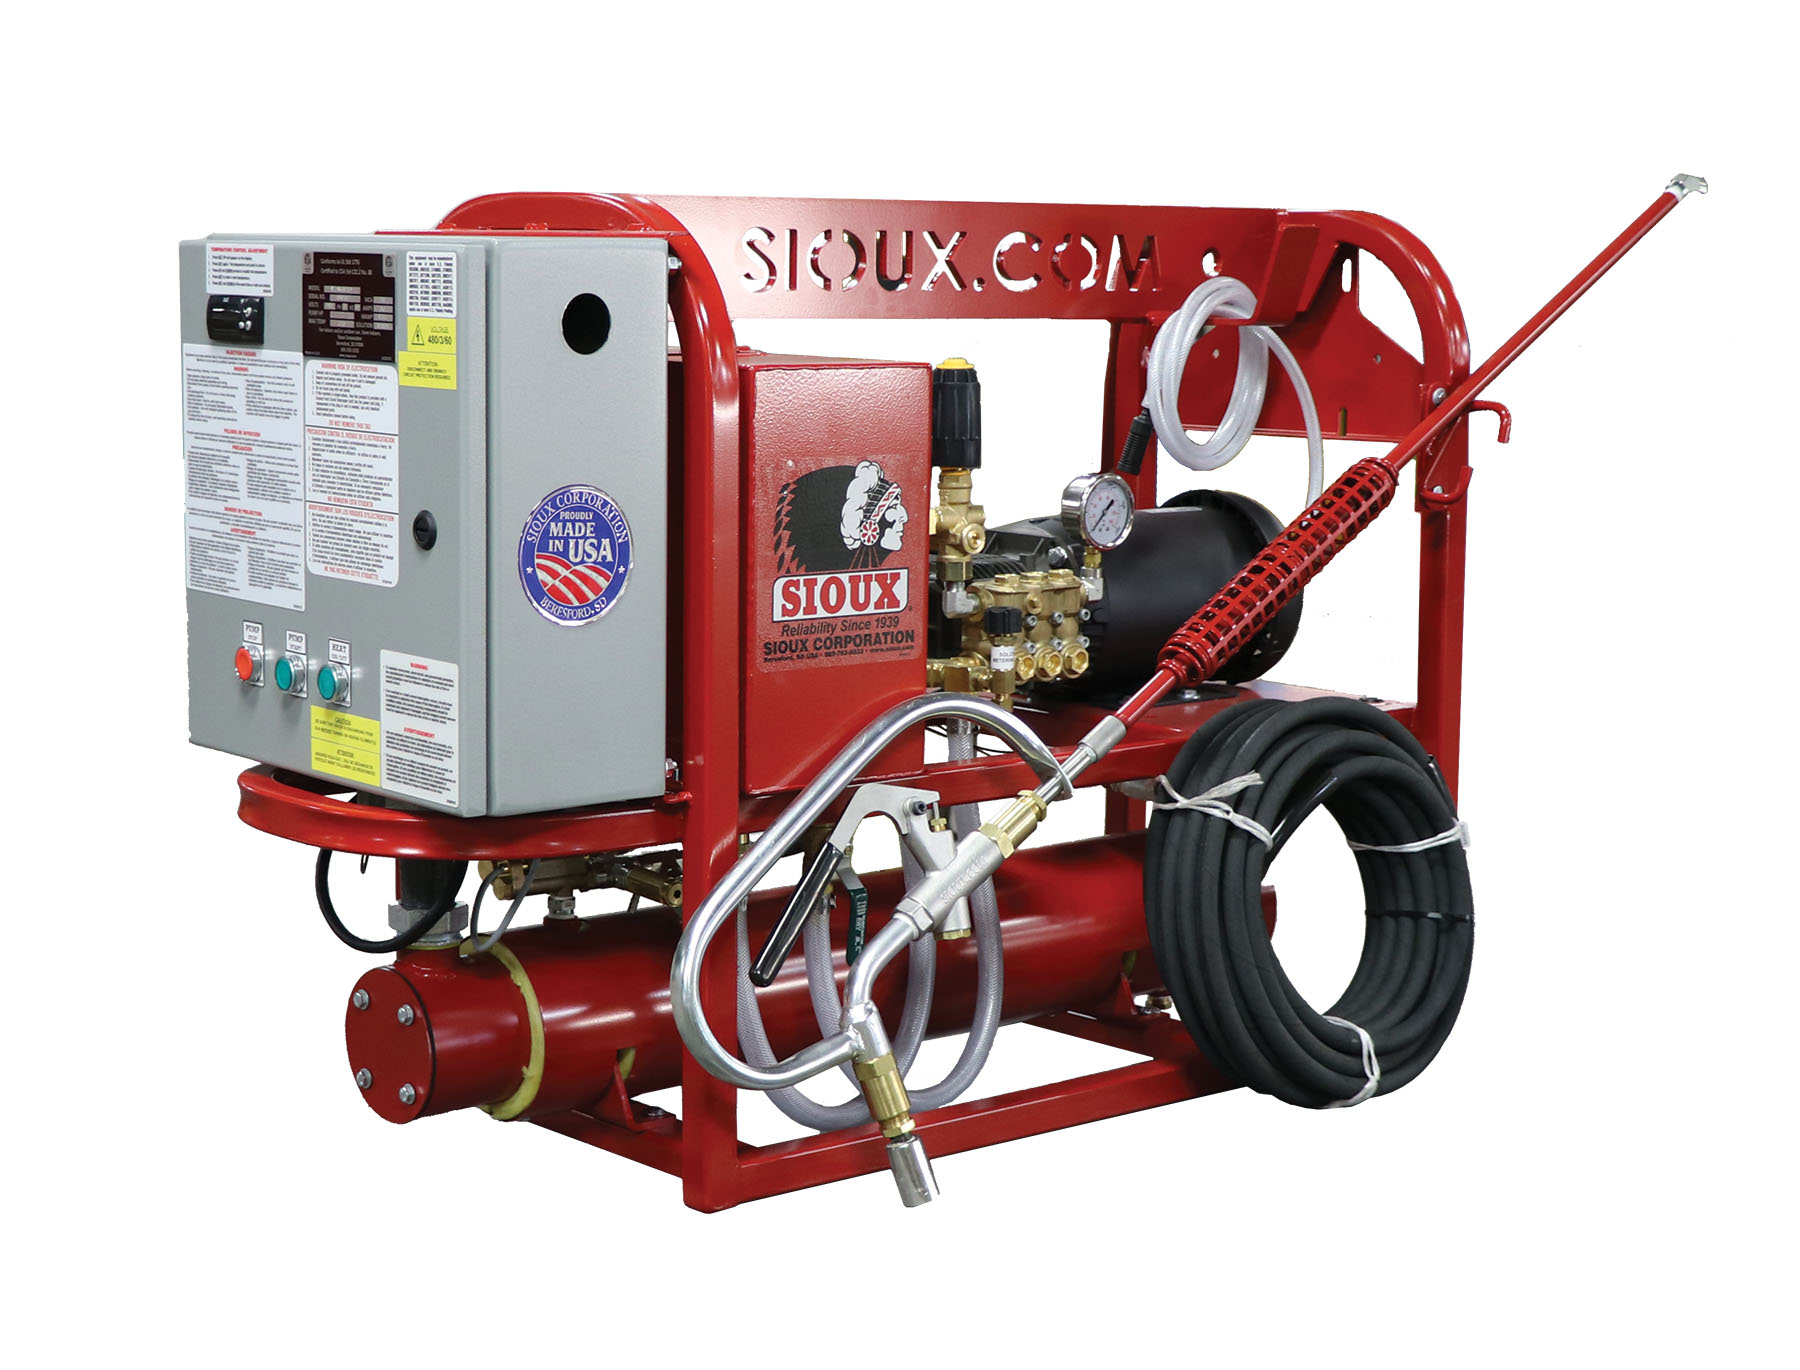 E2.4HS1200 Pressure Washer with Steam Gun